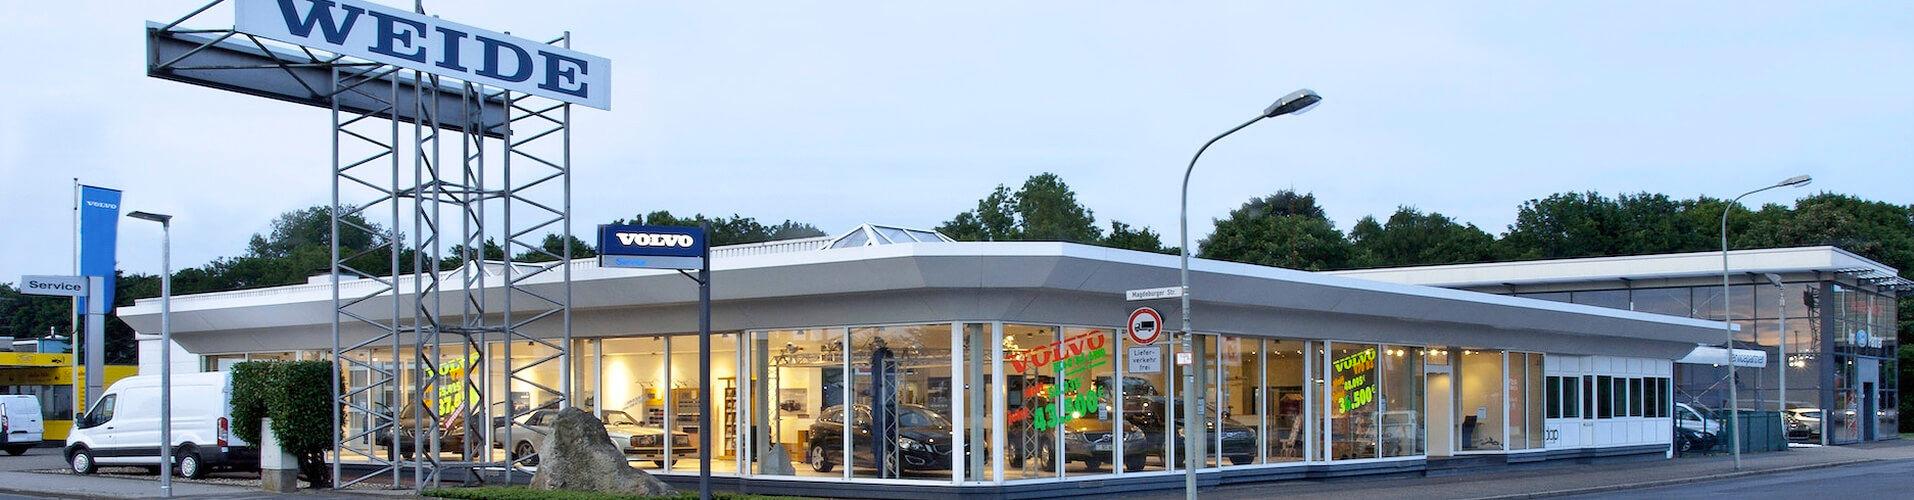 Ihr Volvo Service Partner in Krefeld